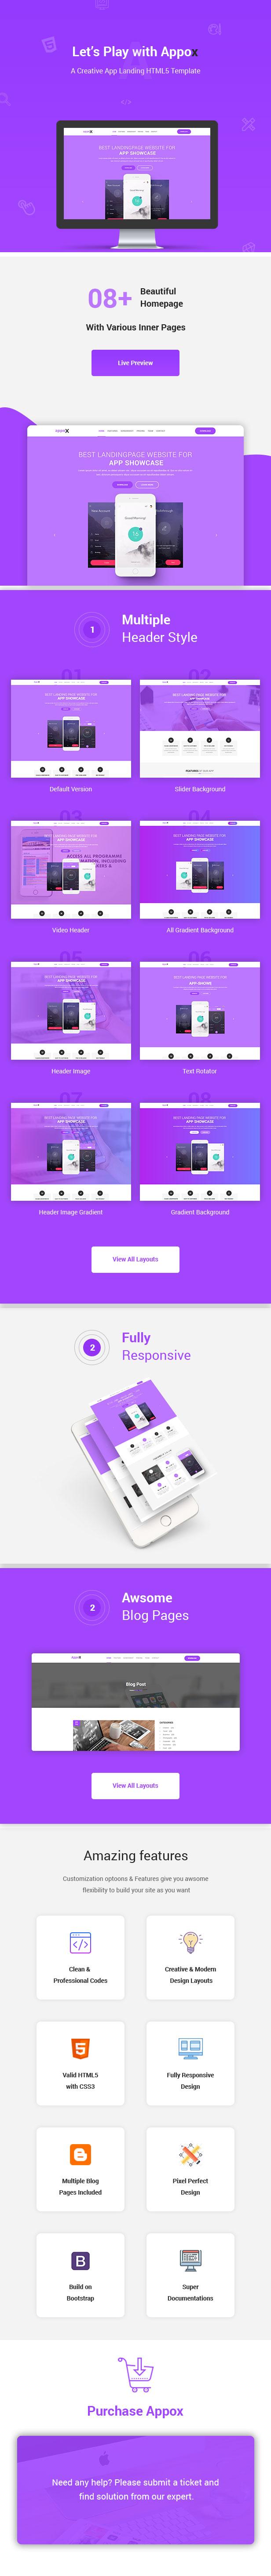 Appox- Responsive HTML5 App Landing Template